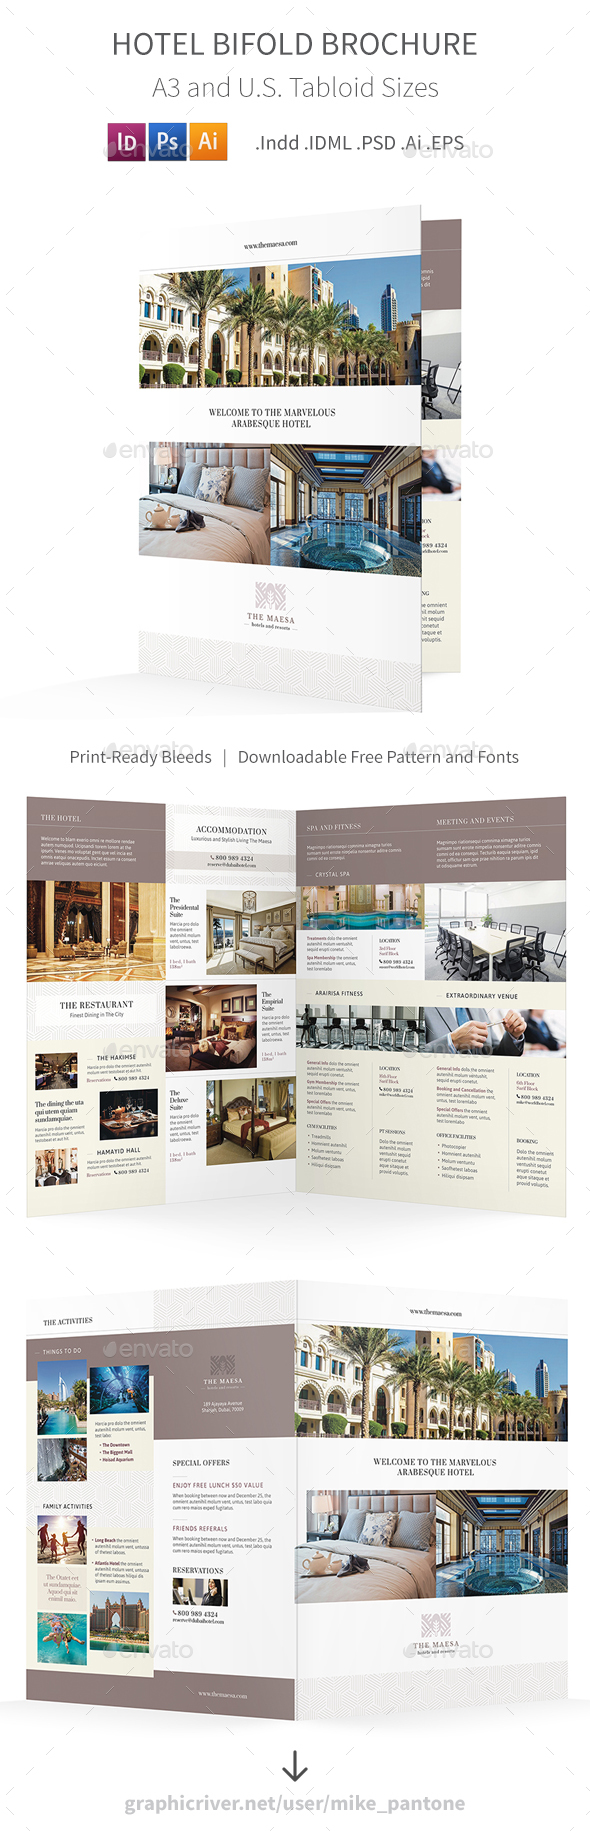 GraphicRiver Hotel Bifold Halffold Brochure 7 20961922